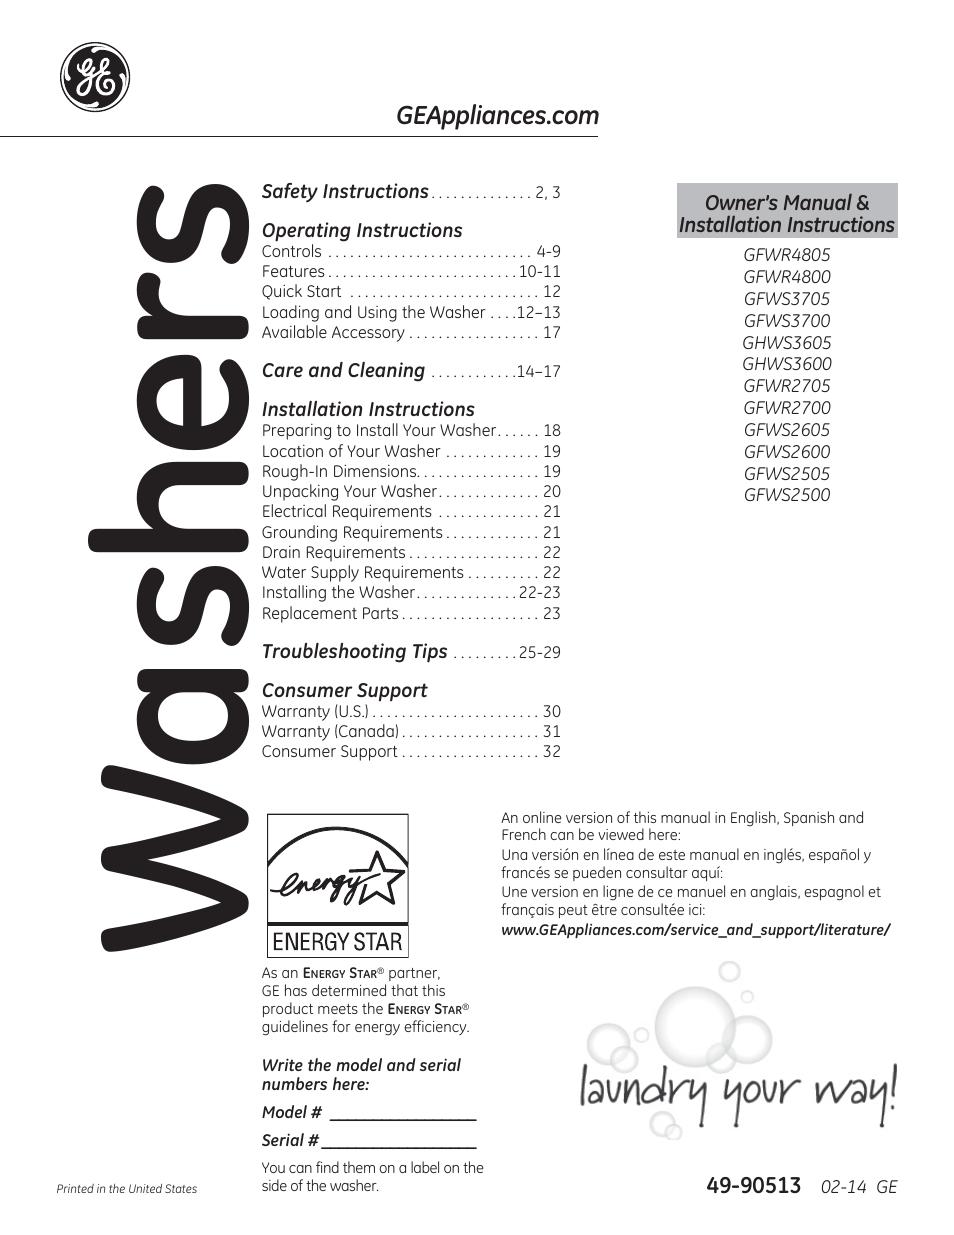 Ge Dryer Service Manual Nissan Np200 Fuse Box Tech Sheet 3977699 Pdf 110 70992990 Array Manuals Rh Getwet Org Uk